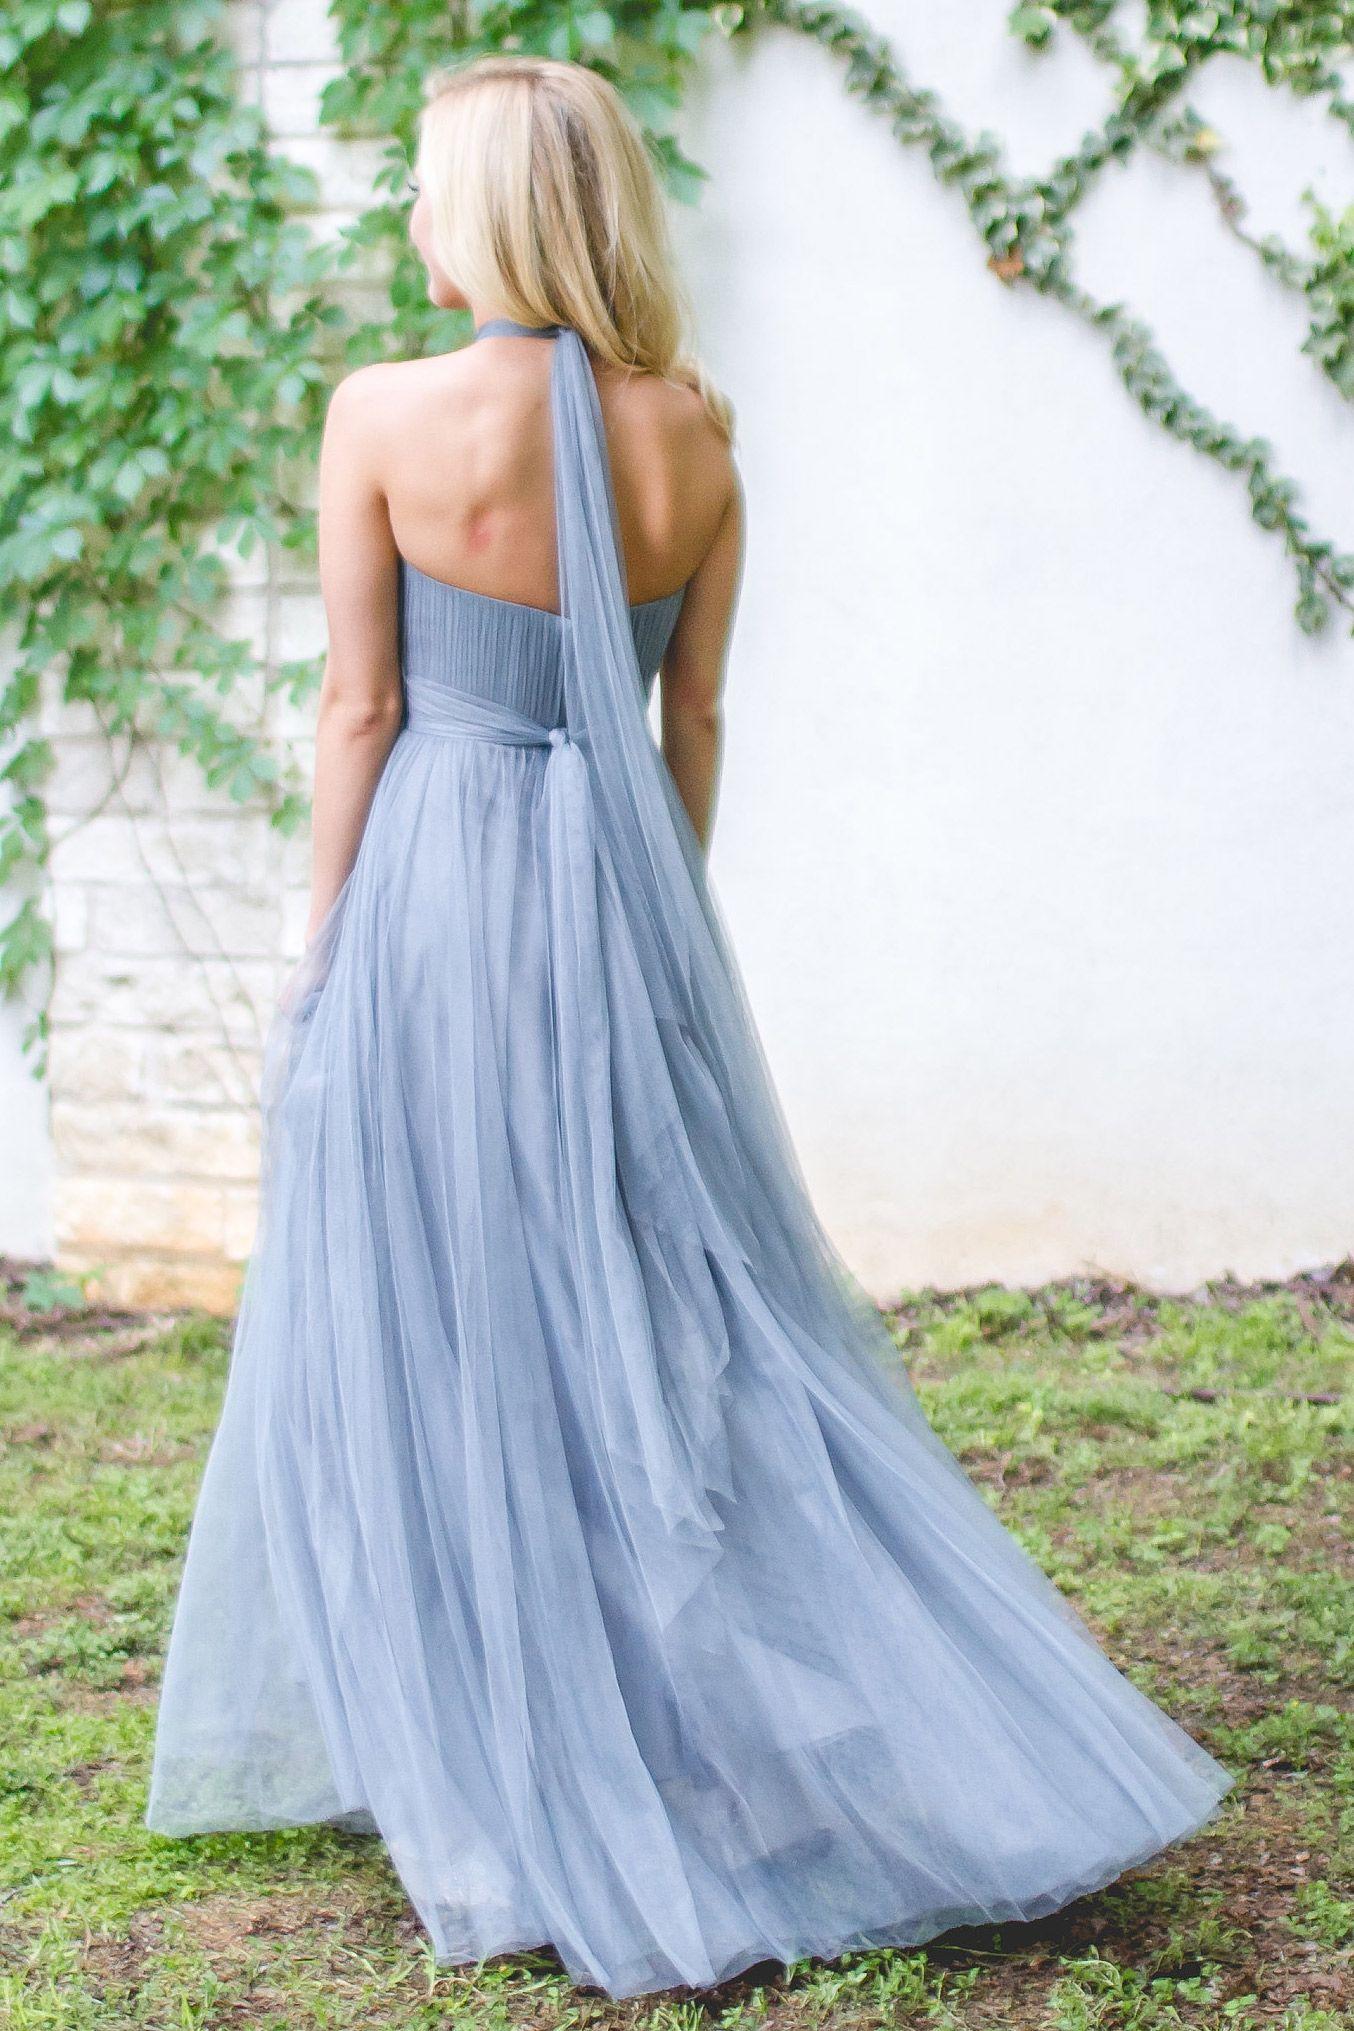 Rosalie Tulle Convertible Dress | Convertible